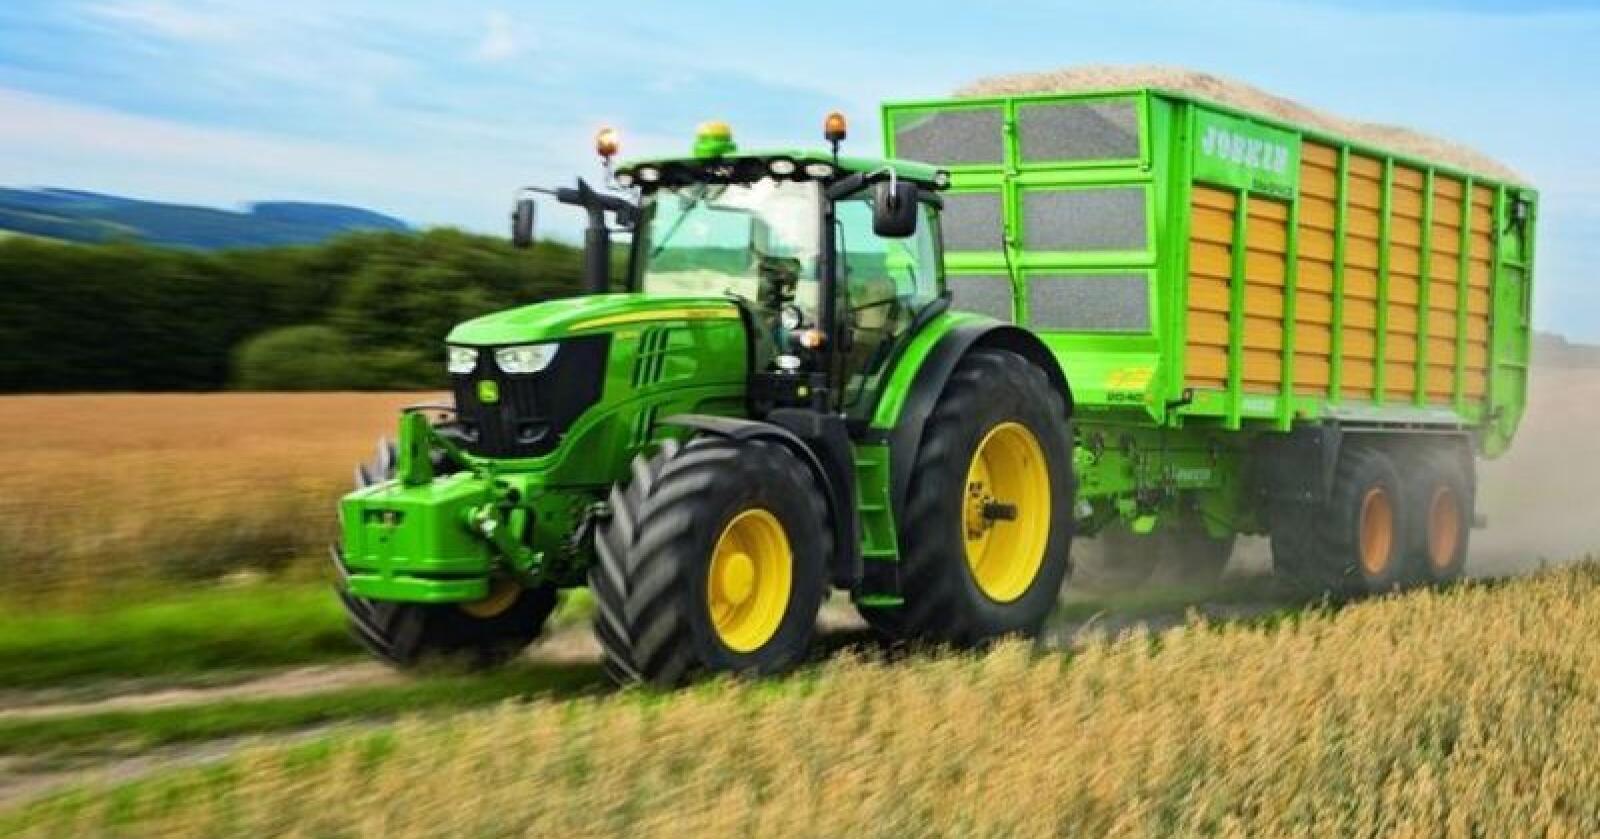 John Deere er månedens bestselger med totalt 85 stk nysolgte traktorer.